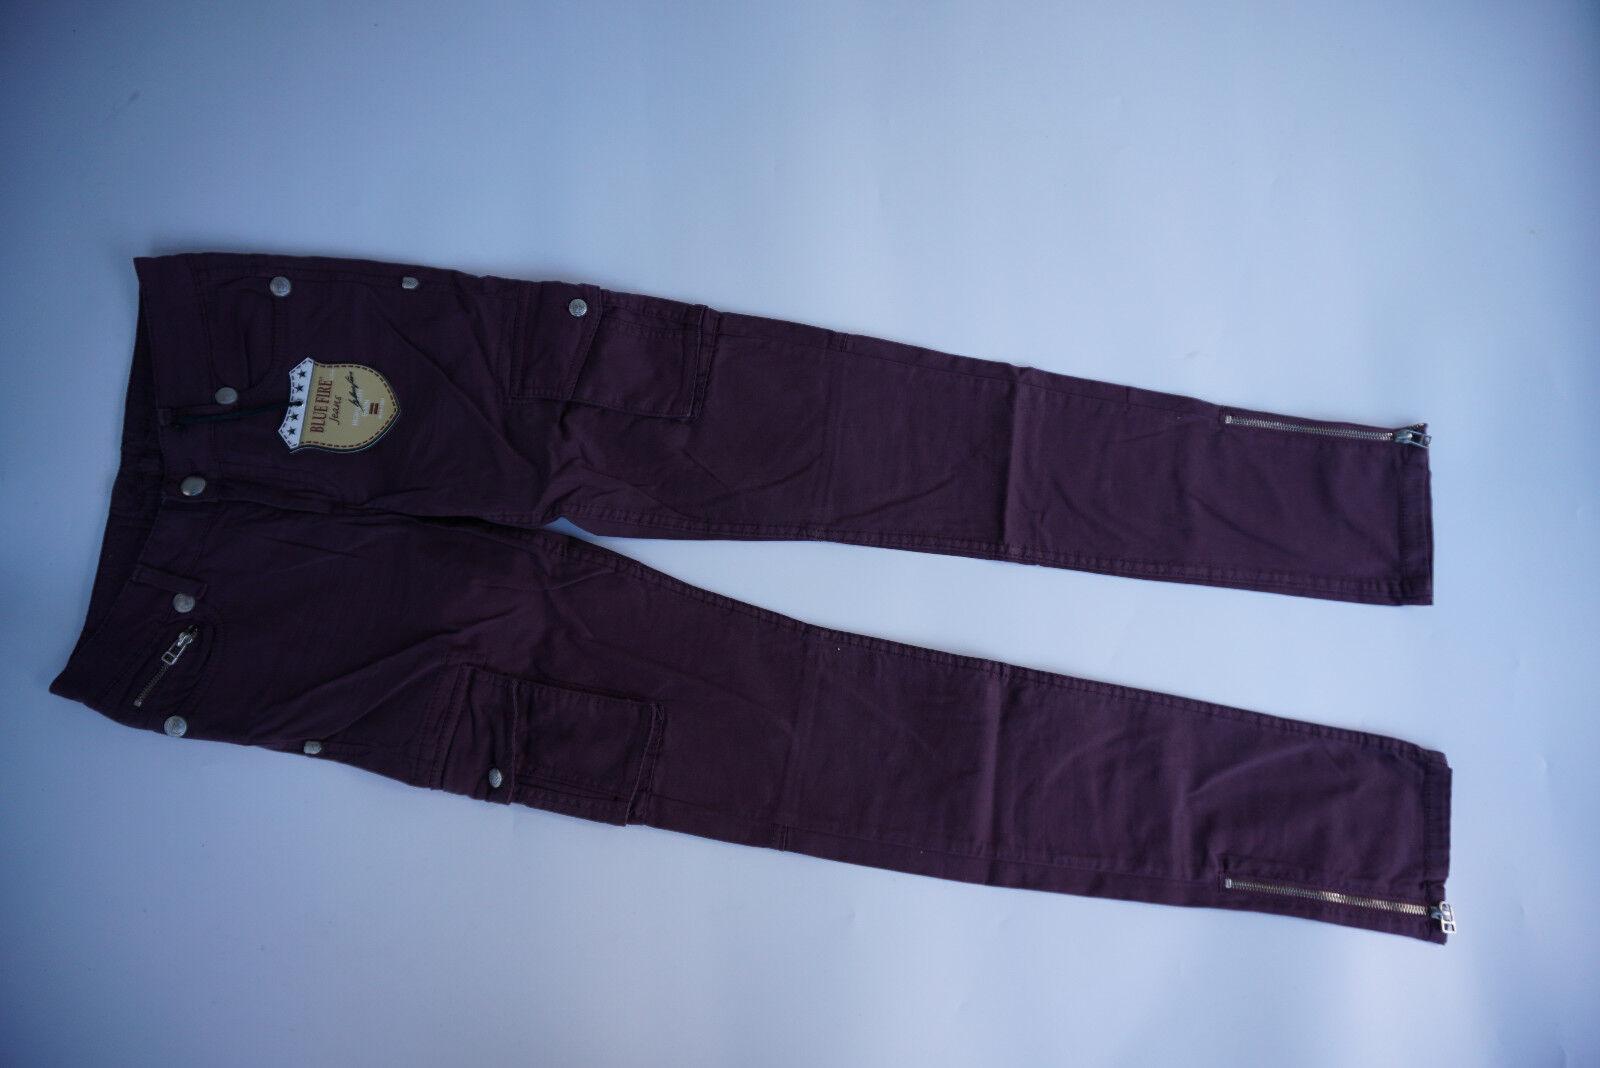 blueE FIRE Tyra Cargo super tight Stretch Jeans Hose purple 28 32 W28 L32 NEU B1